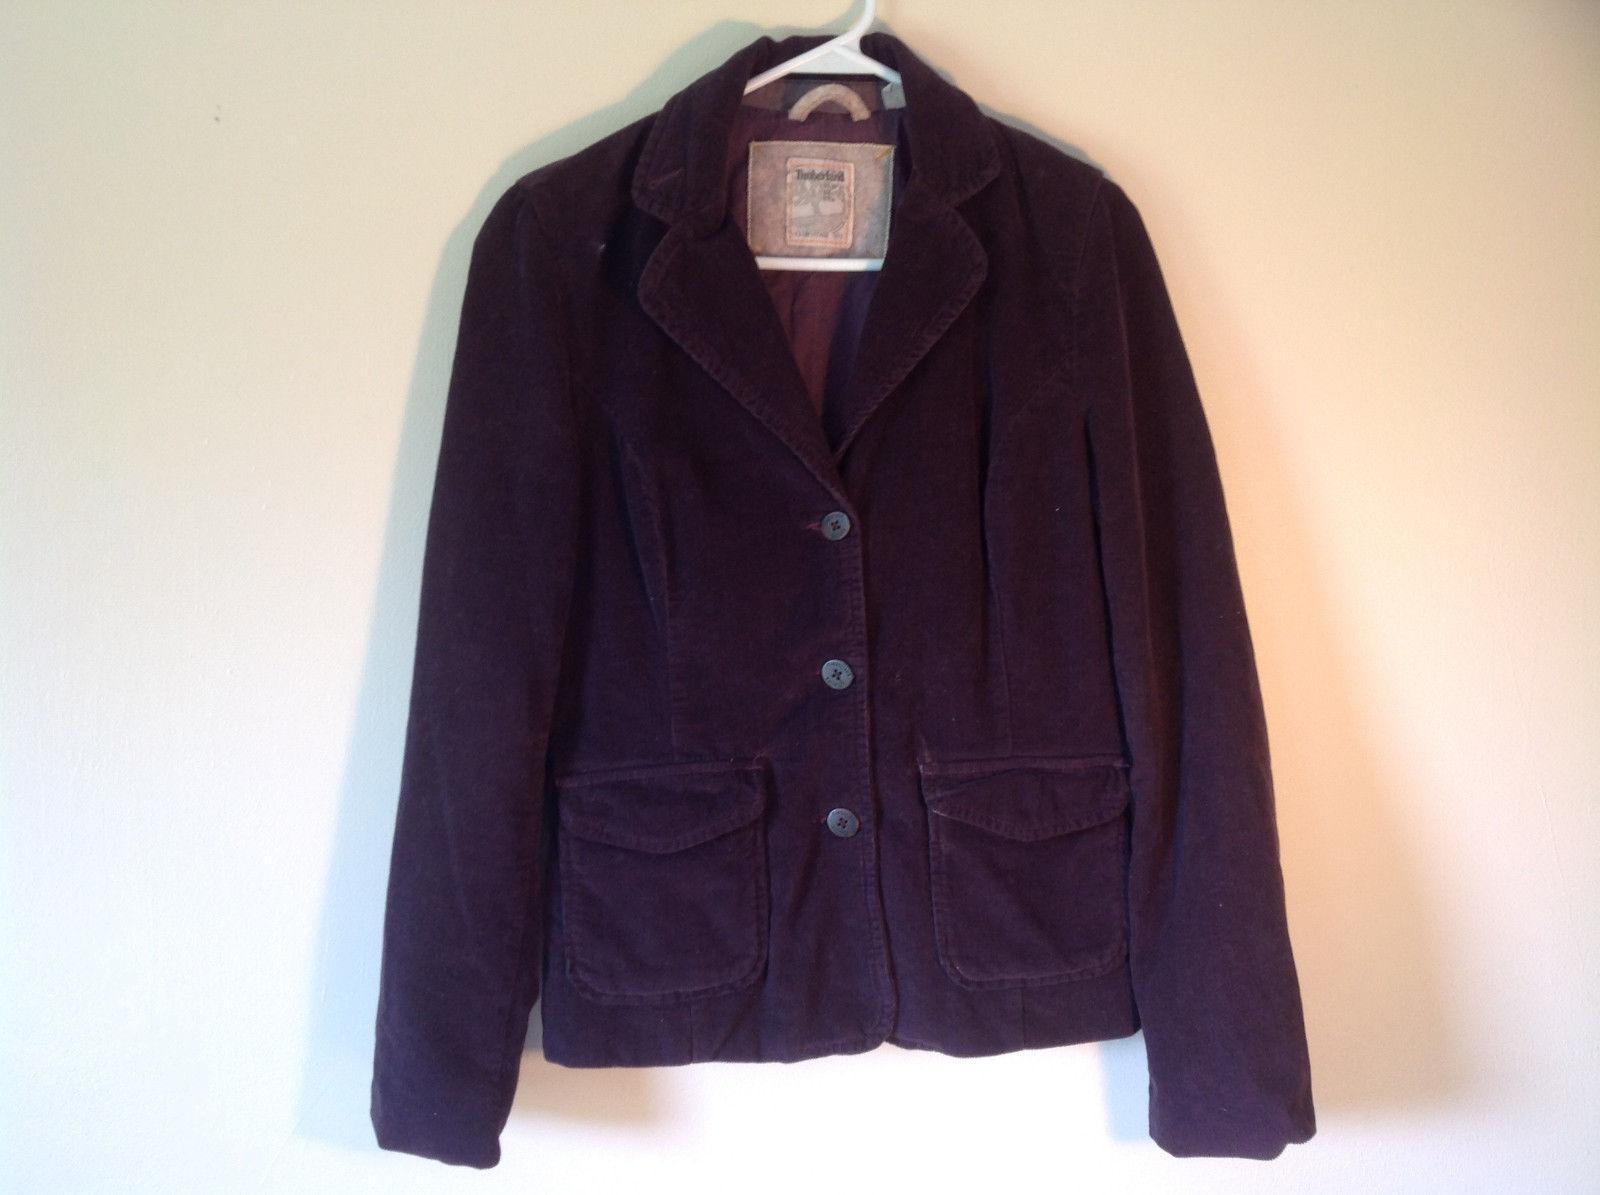 Dark Brown Timberland Corduroy Jacket 2 Front Pockets 3 Button Closure Size 8